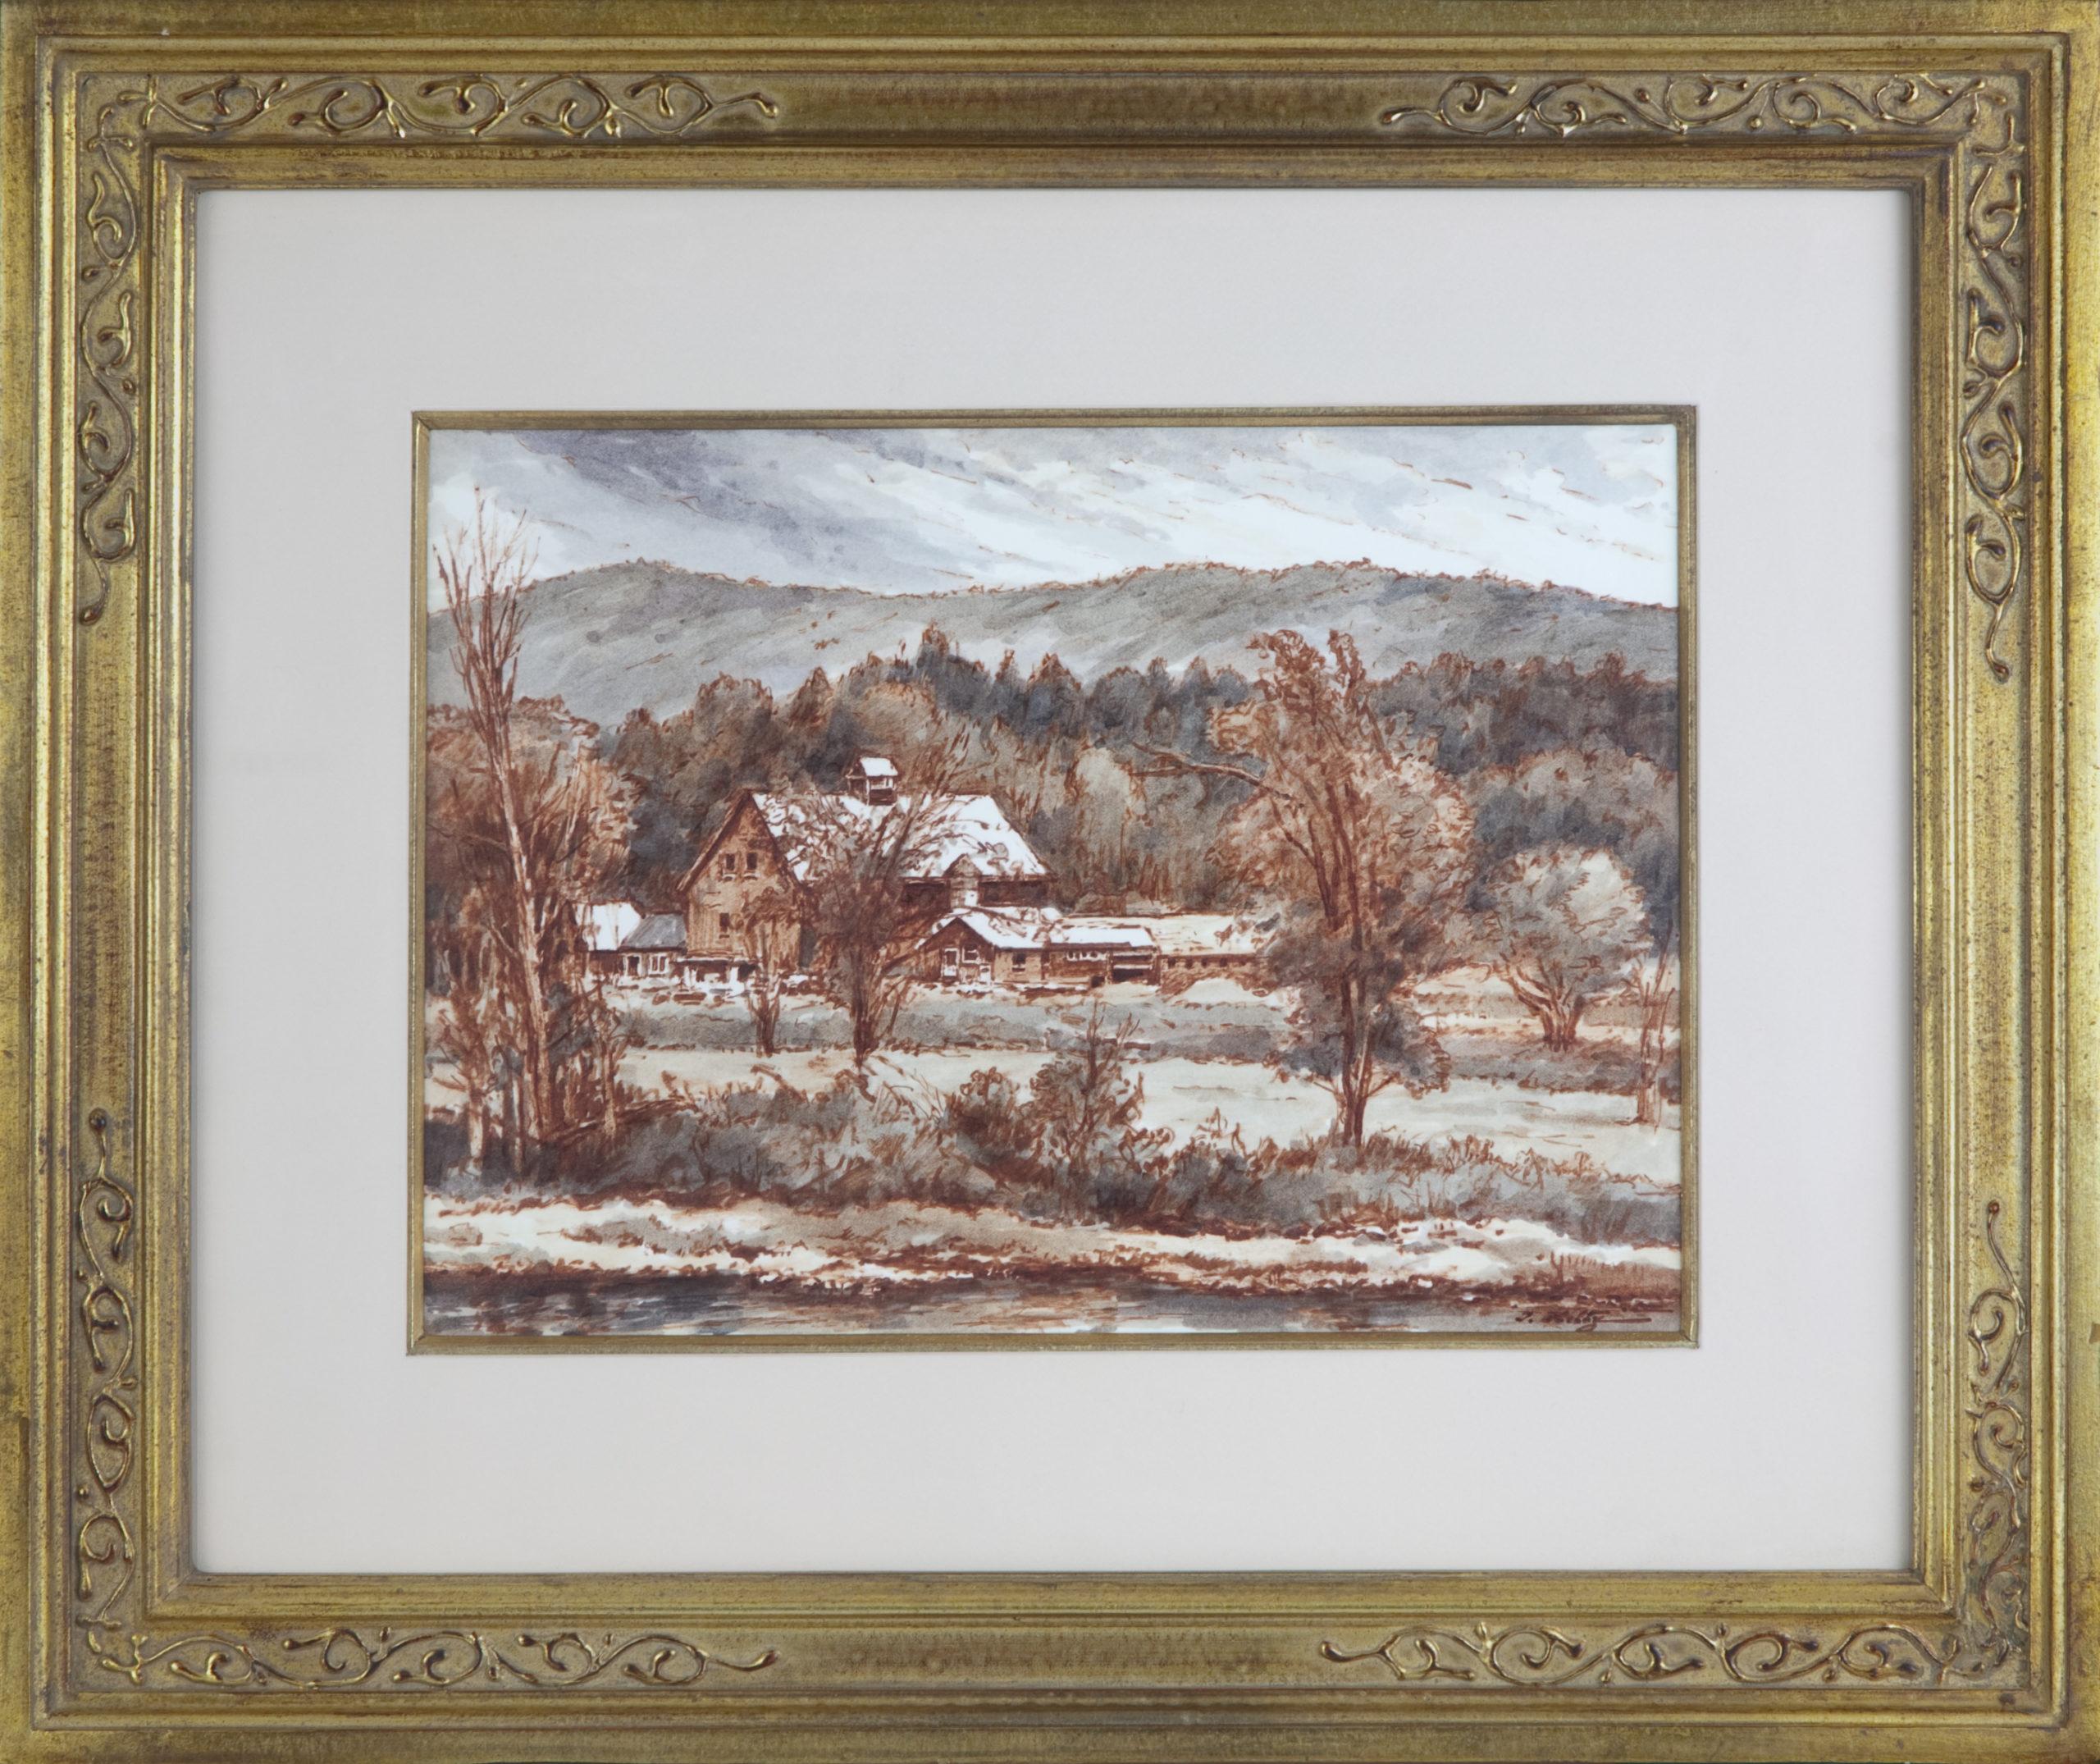 157 New England Farm 1973 - Marker - 15 x 11 - Frame: 25 x 20.5 x 1.5